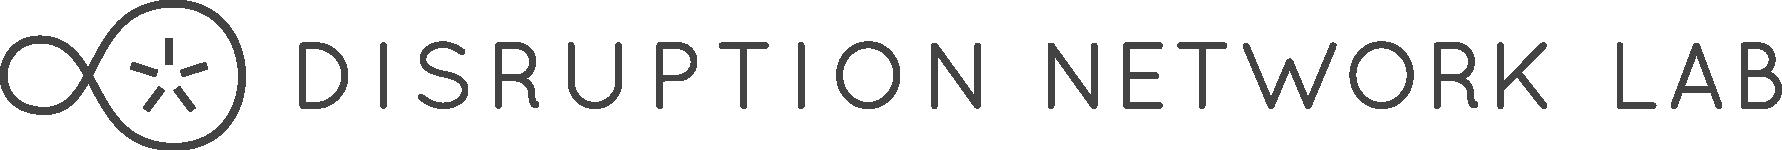 Disruptionlab Logo Horisontal Darkgrey.png